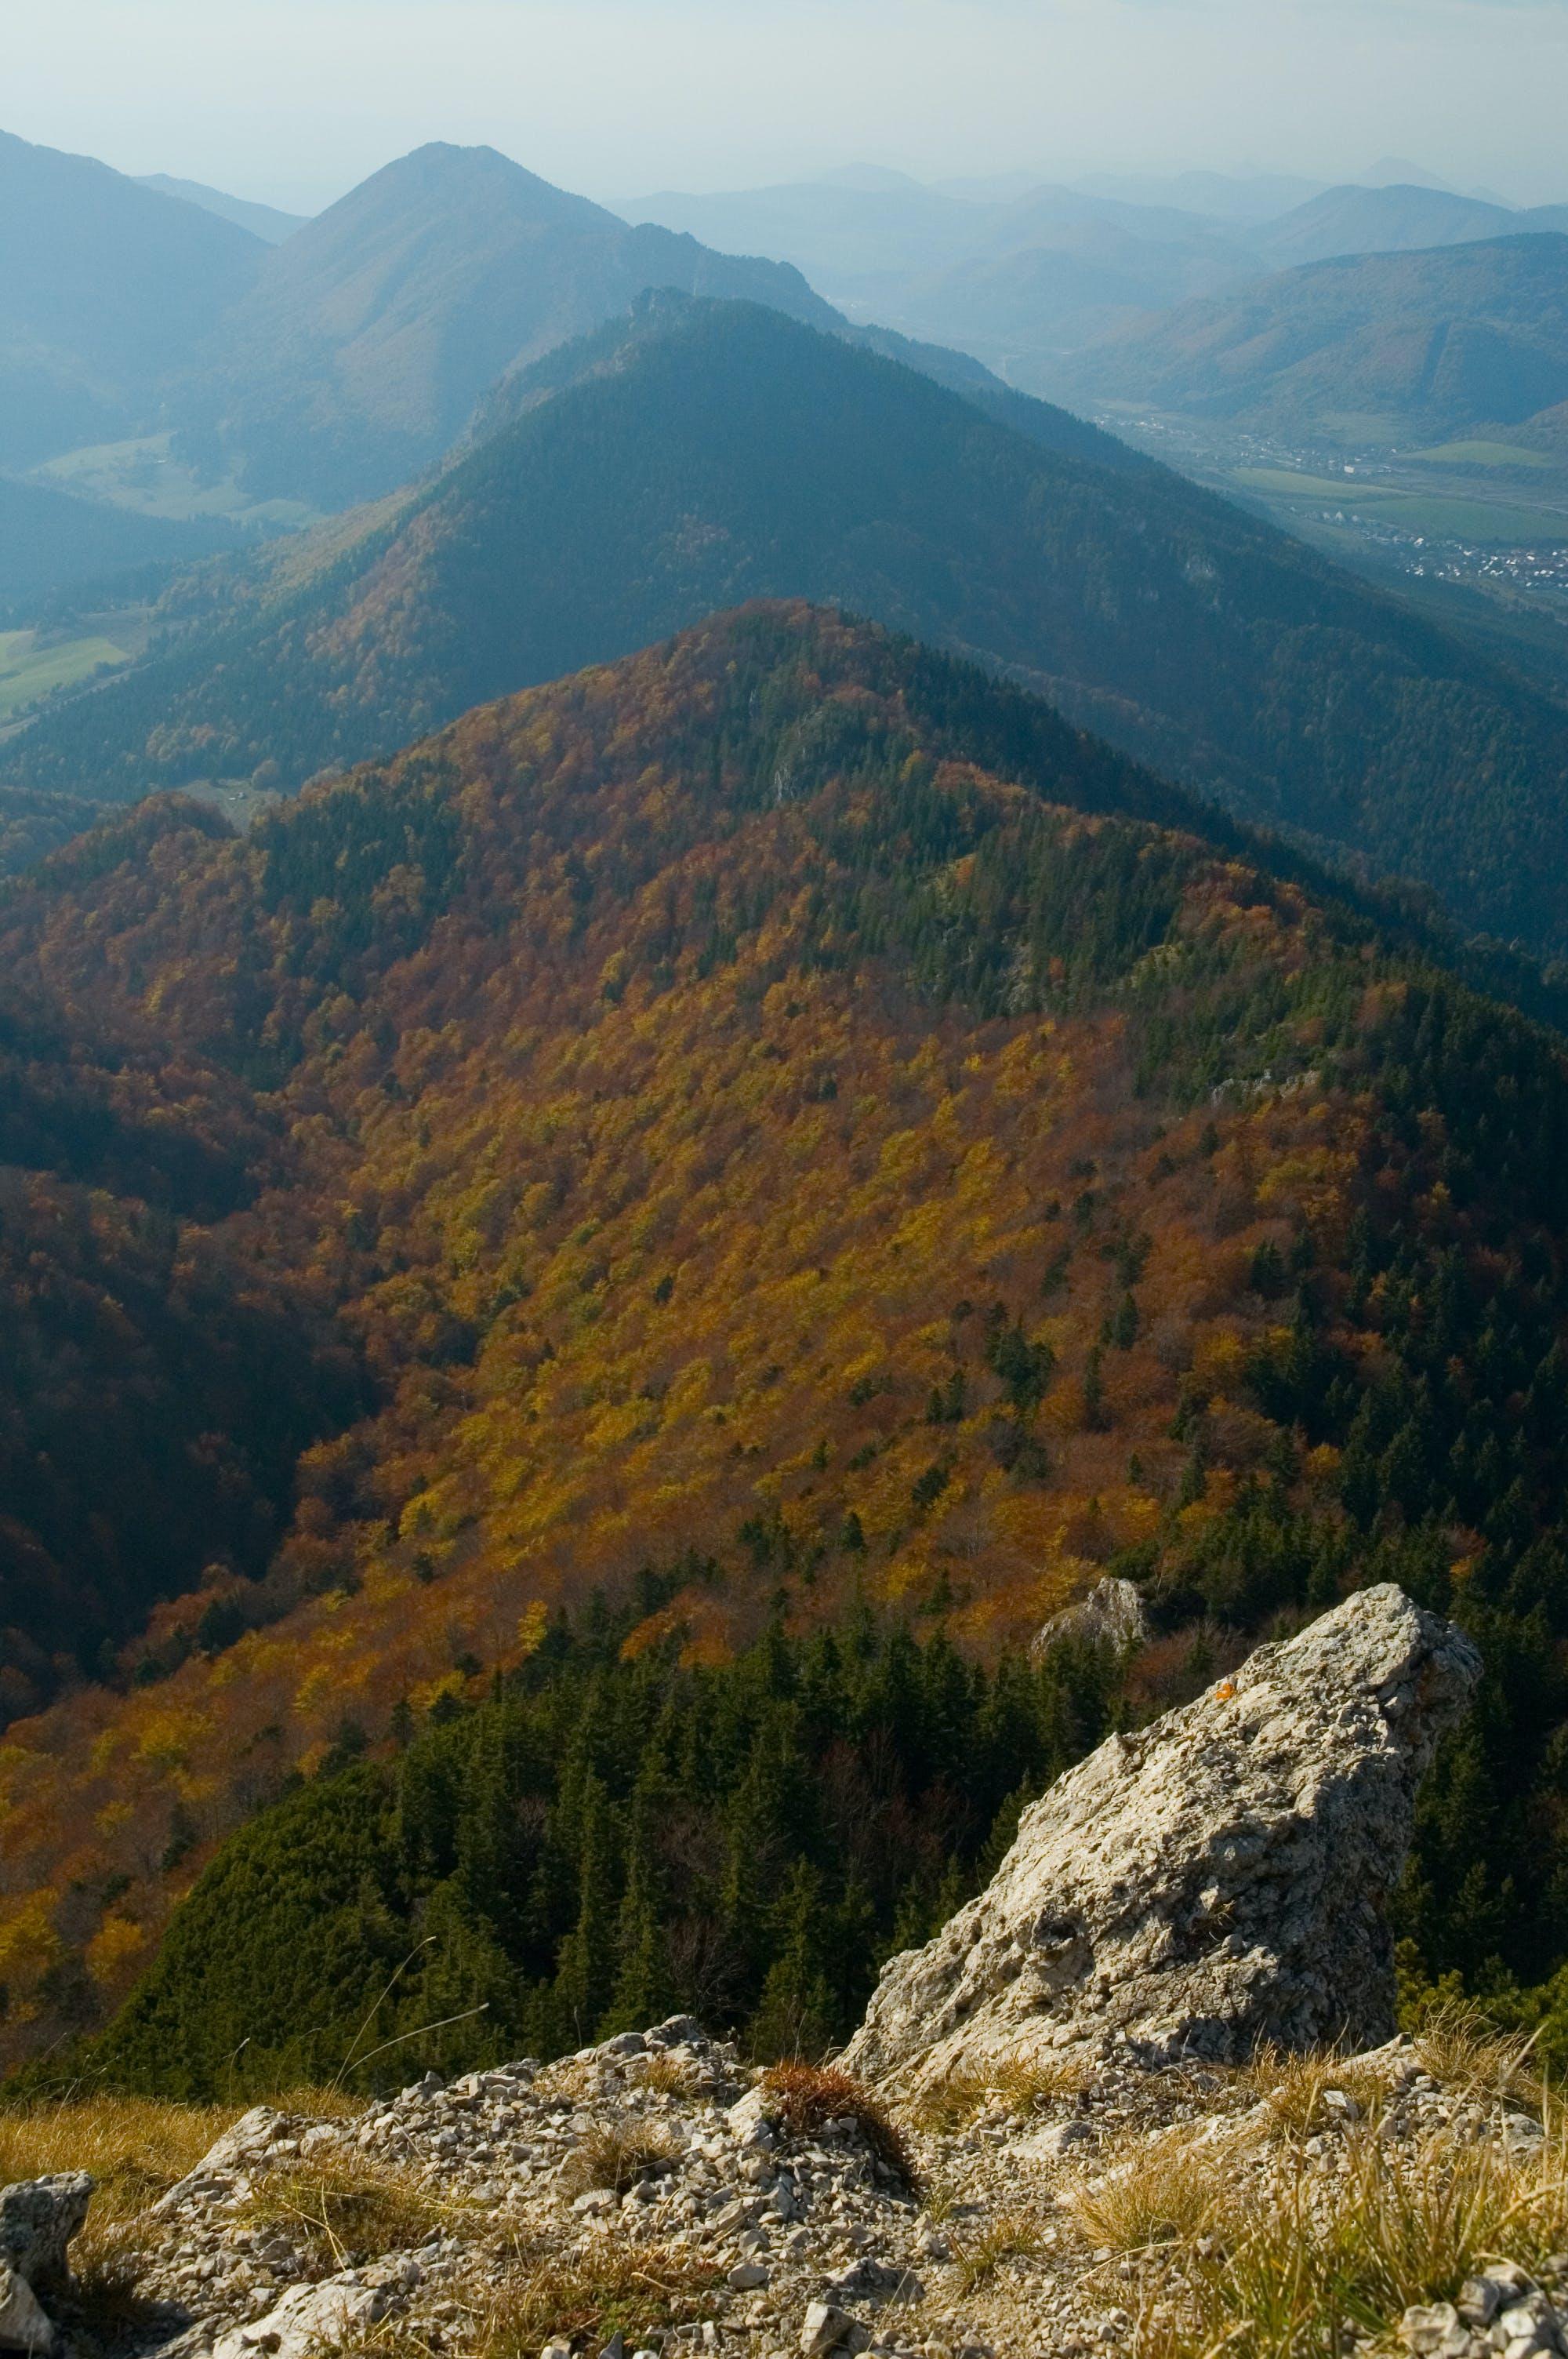 Kostenloses Stock Foto zu abenteuer, bäume, berg, felsen